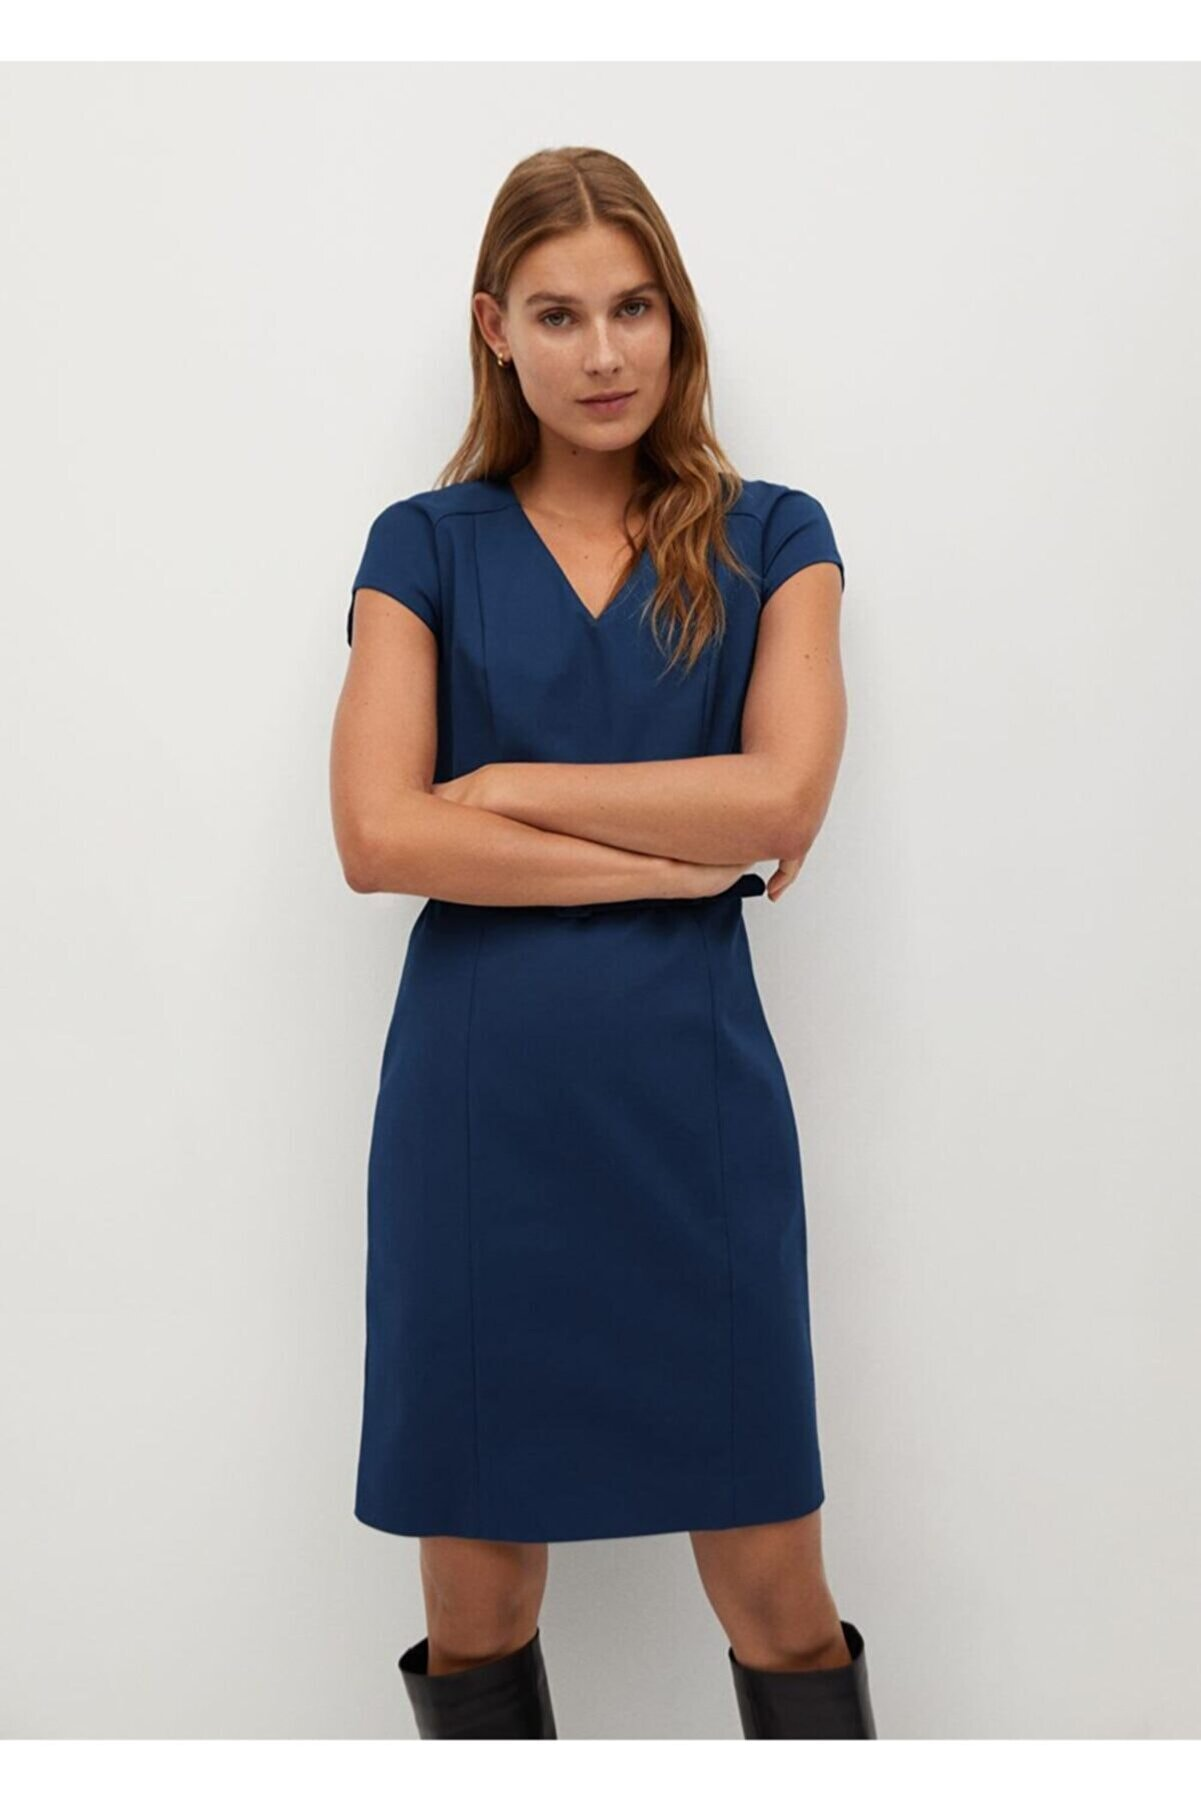 Mango Kadın Lacivert Tailored Kısa Elbise